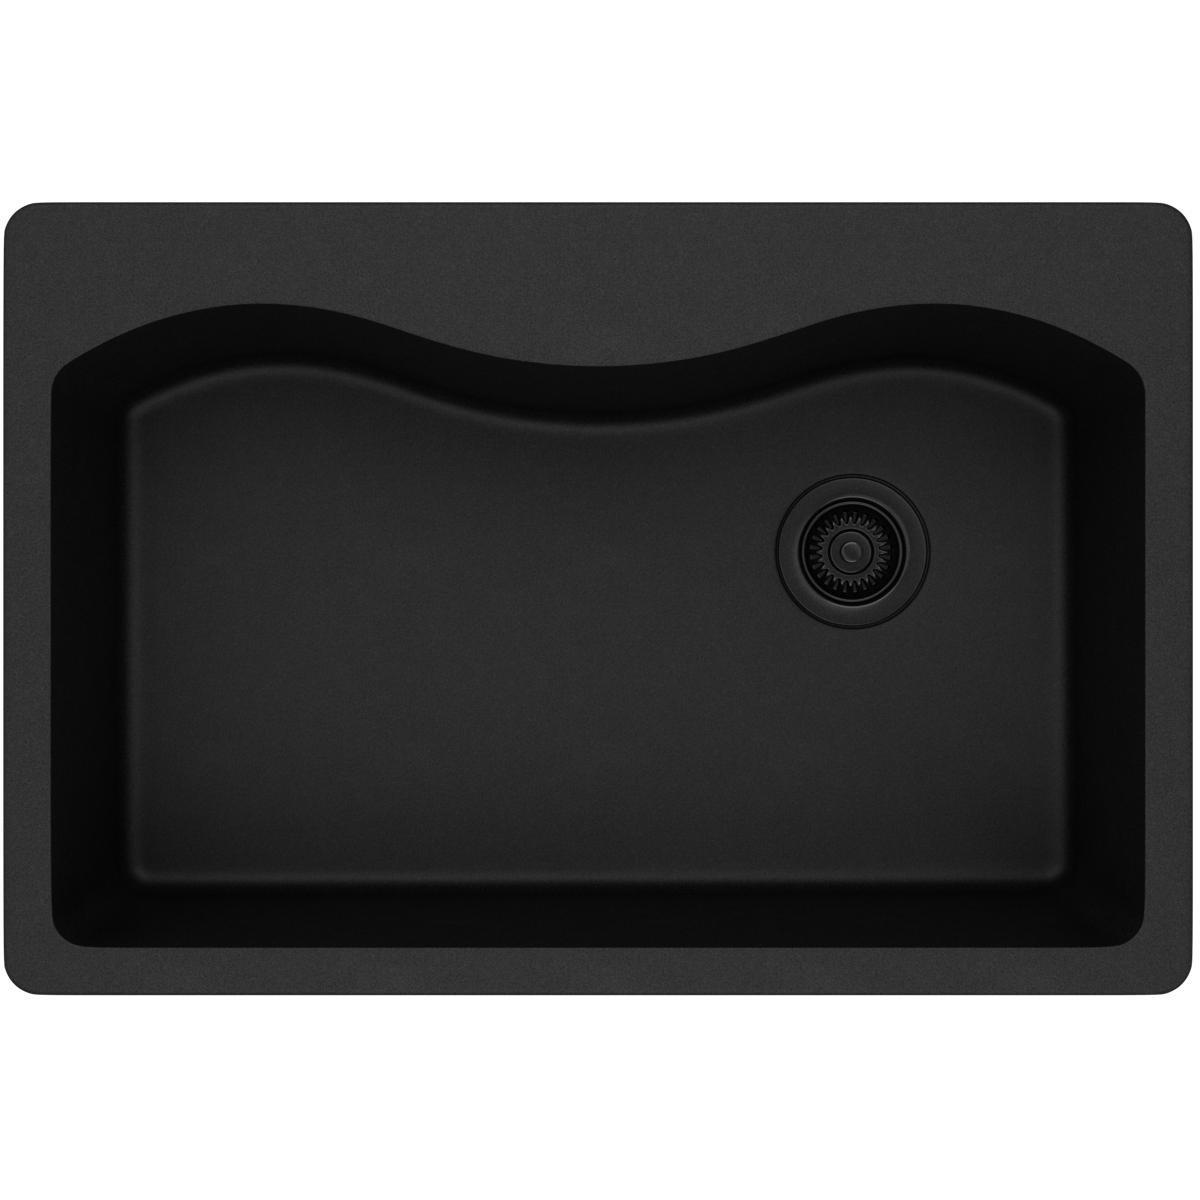 Elkay ELGS3322RBK0 Quartz Classic Single Bowl Drop-in Sink, Black